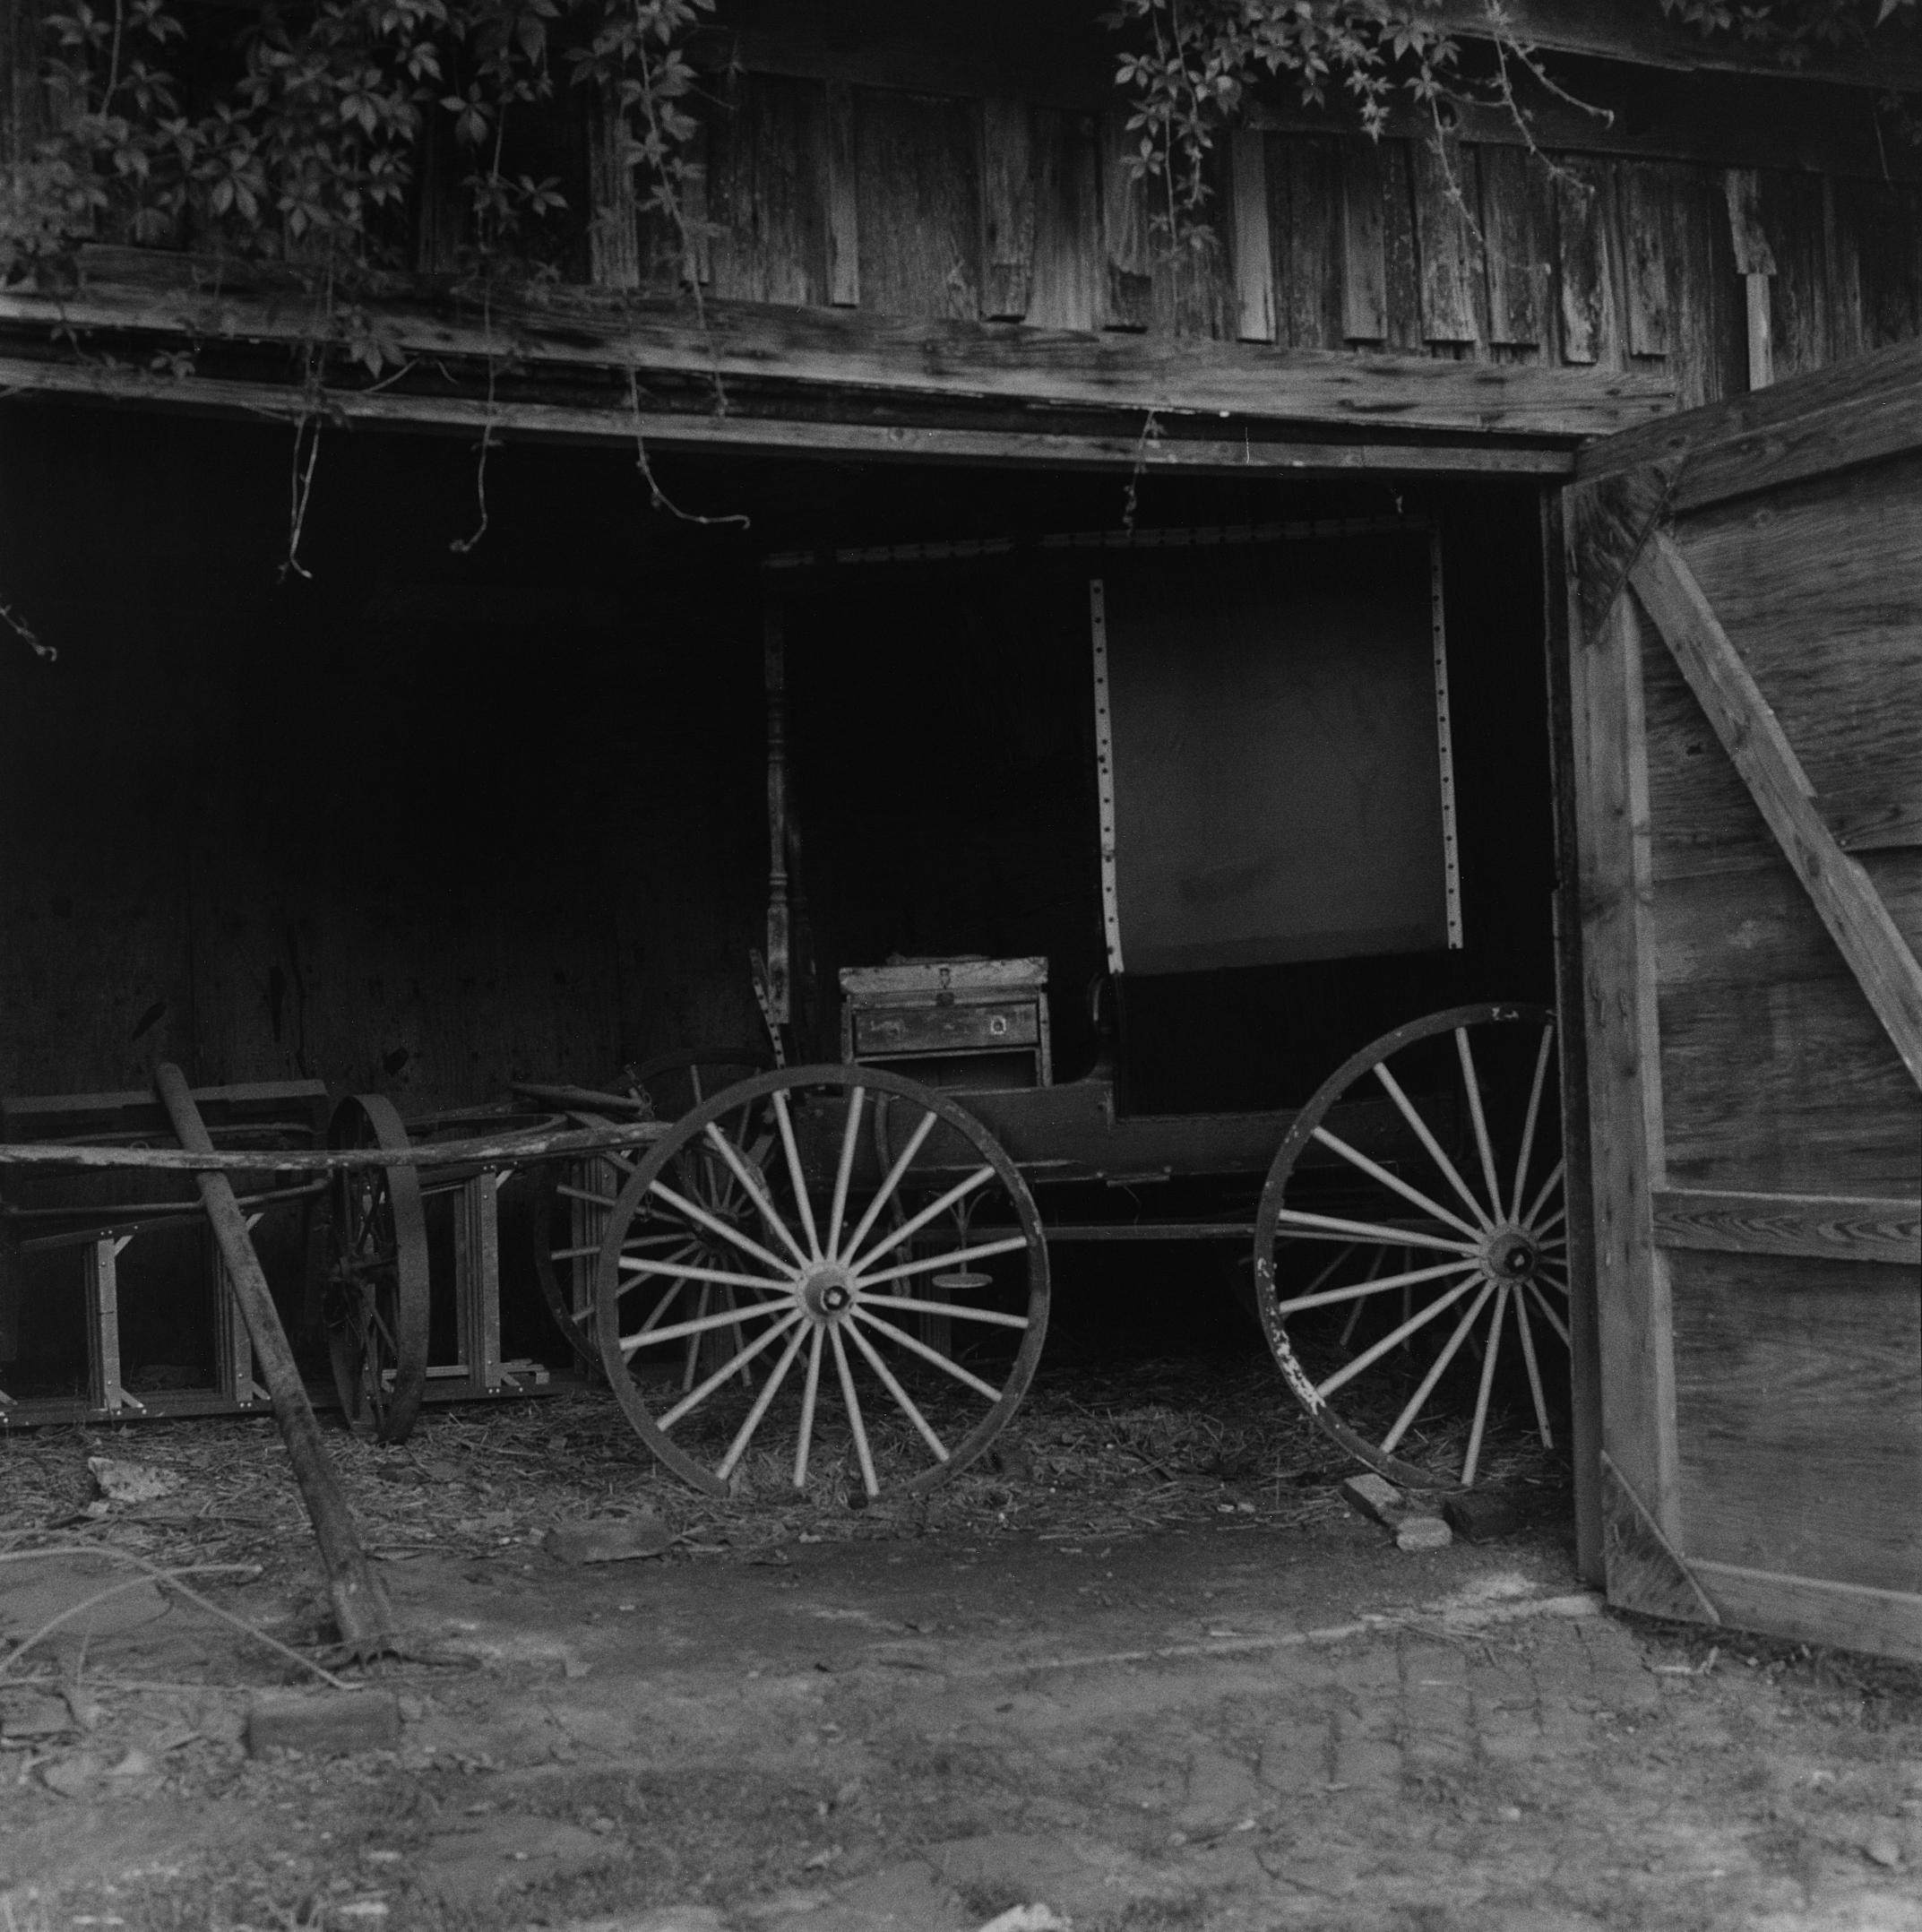 Burkle Estate Farm, Underground Railroad Station, Memphis, Tennessee, 2010